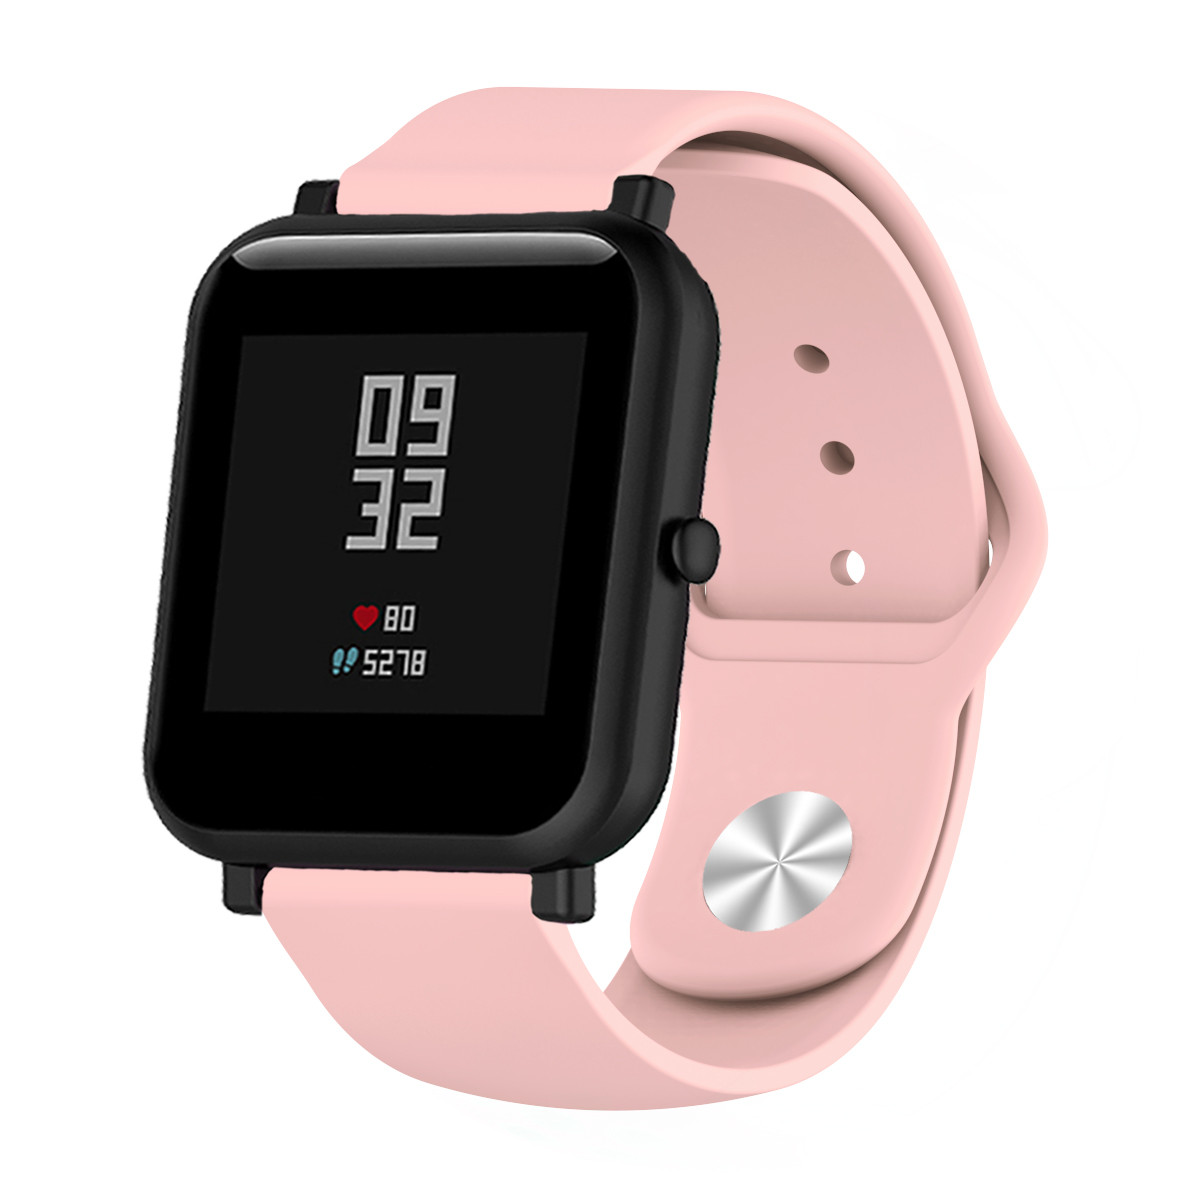 Ремешок Sport Nike Youth для Xiaomi AMAZFIT Bip / 20 мм Pink (Розовый)